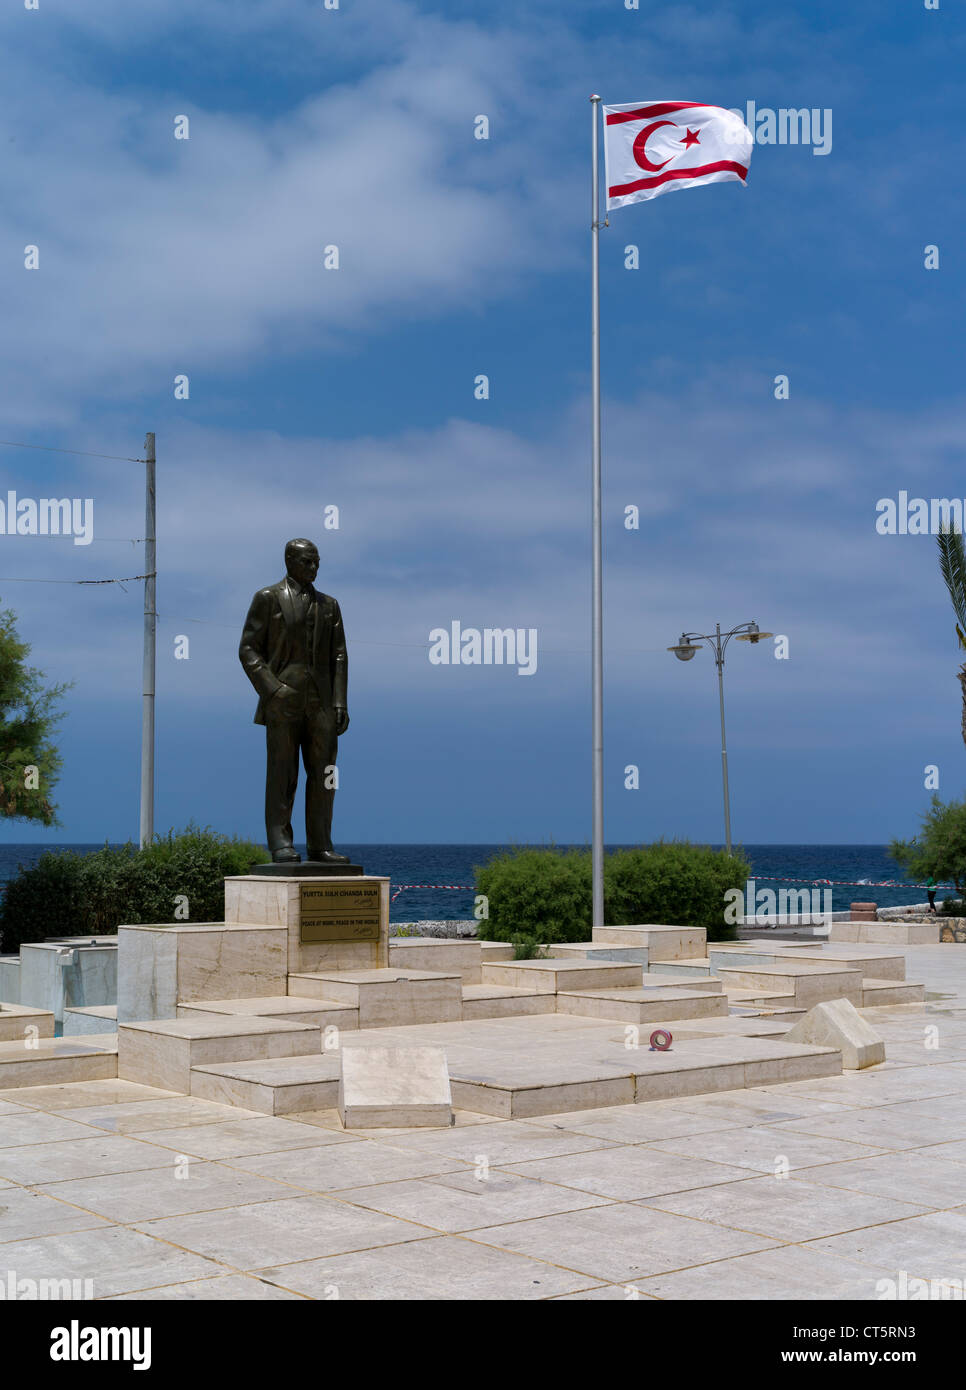 dh  KYRENIA NORTHERN CYPRUS Mustafa Kemal Ataturk statue flag Turkish republic of Northern Cyprus - Stock Image